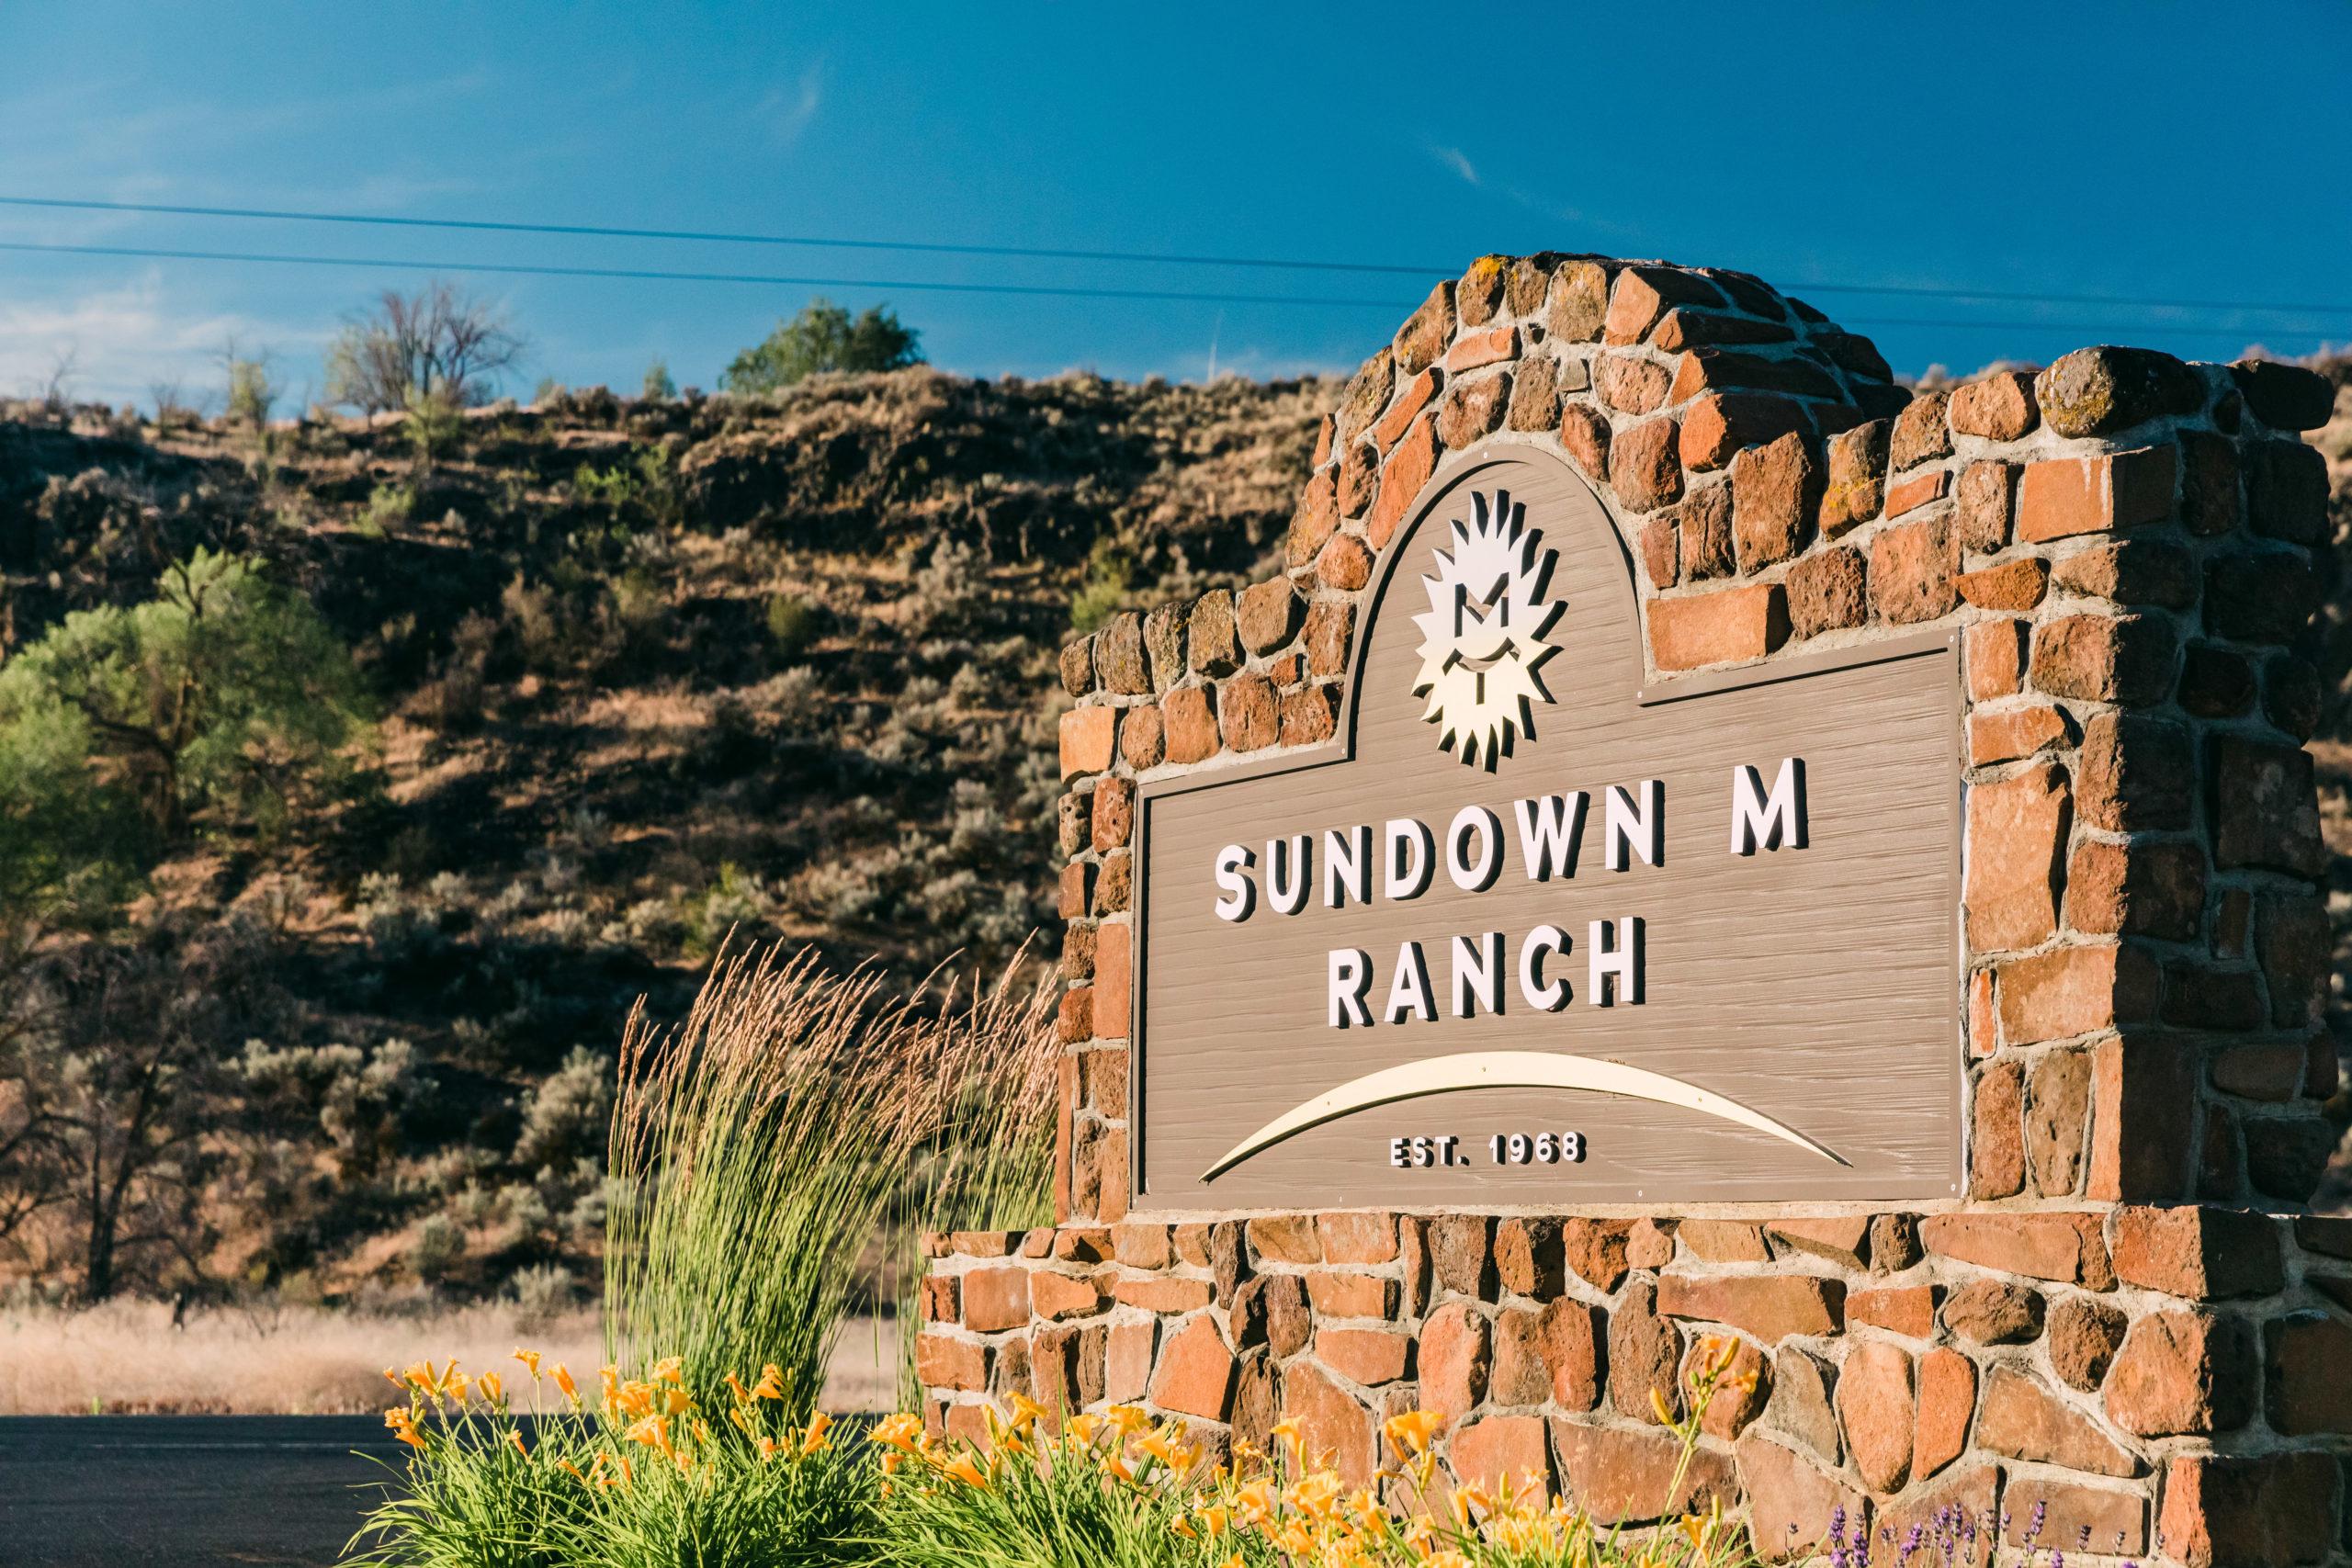 SundownMRanch-20200626-369A4724